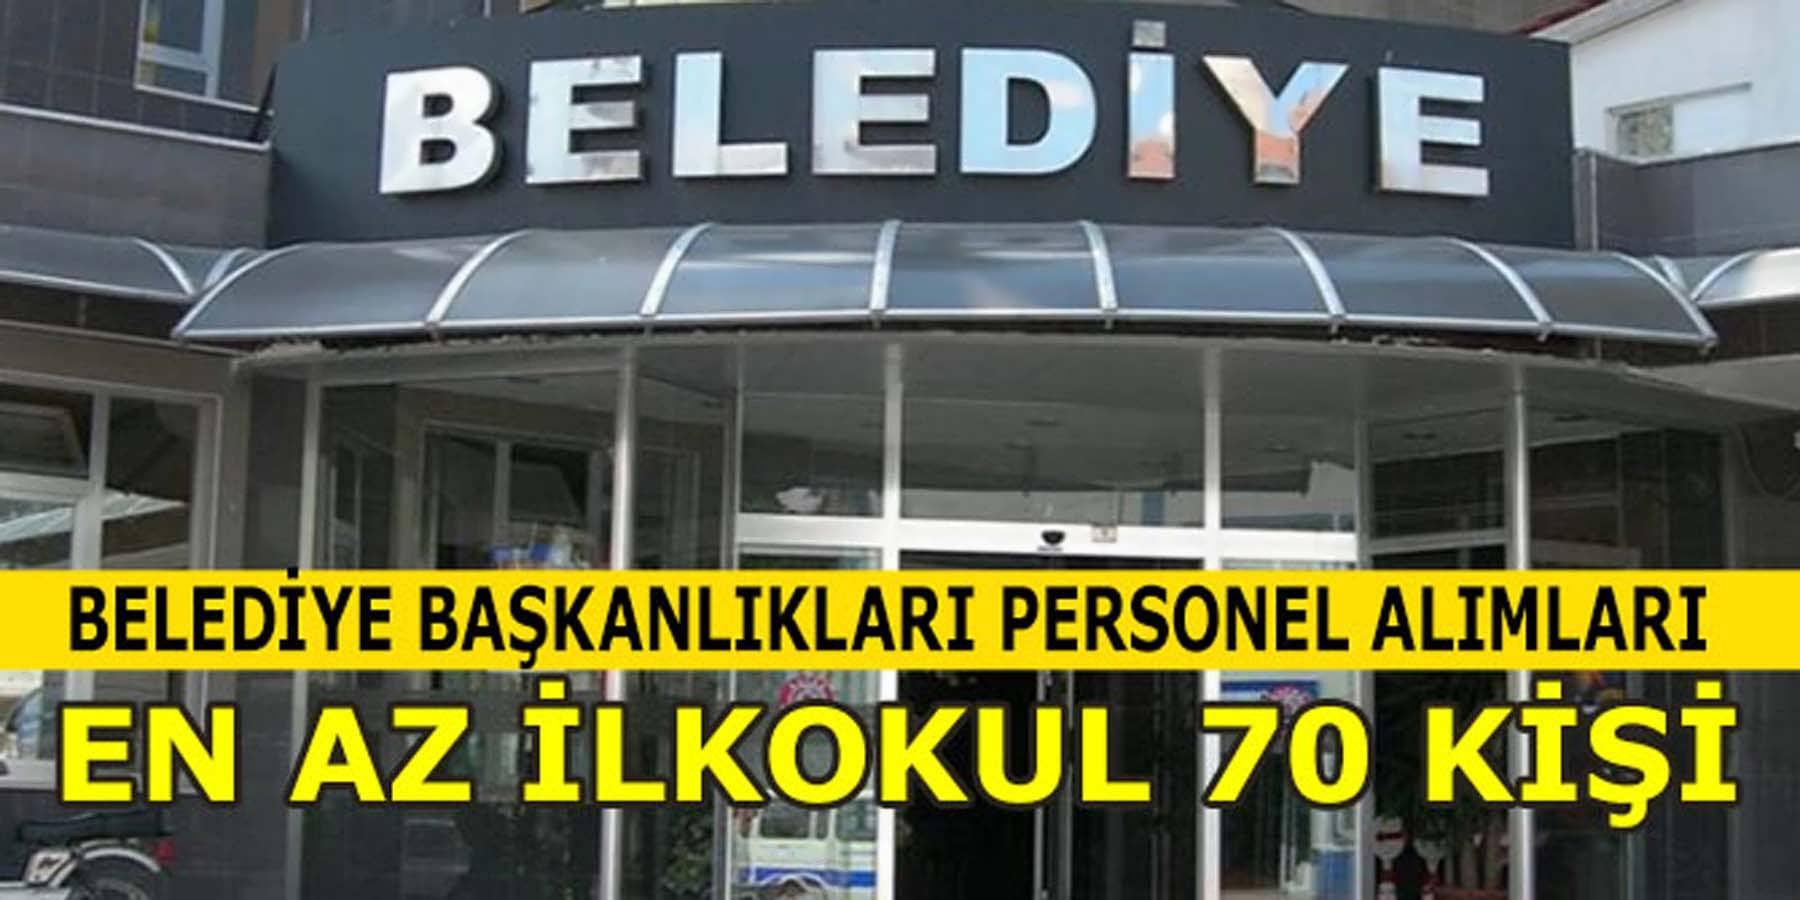 Antalya 70 Personel Alımı İş İlanları